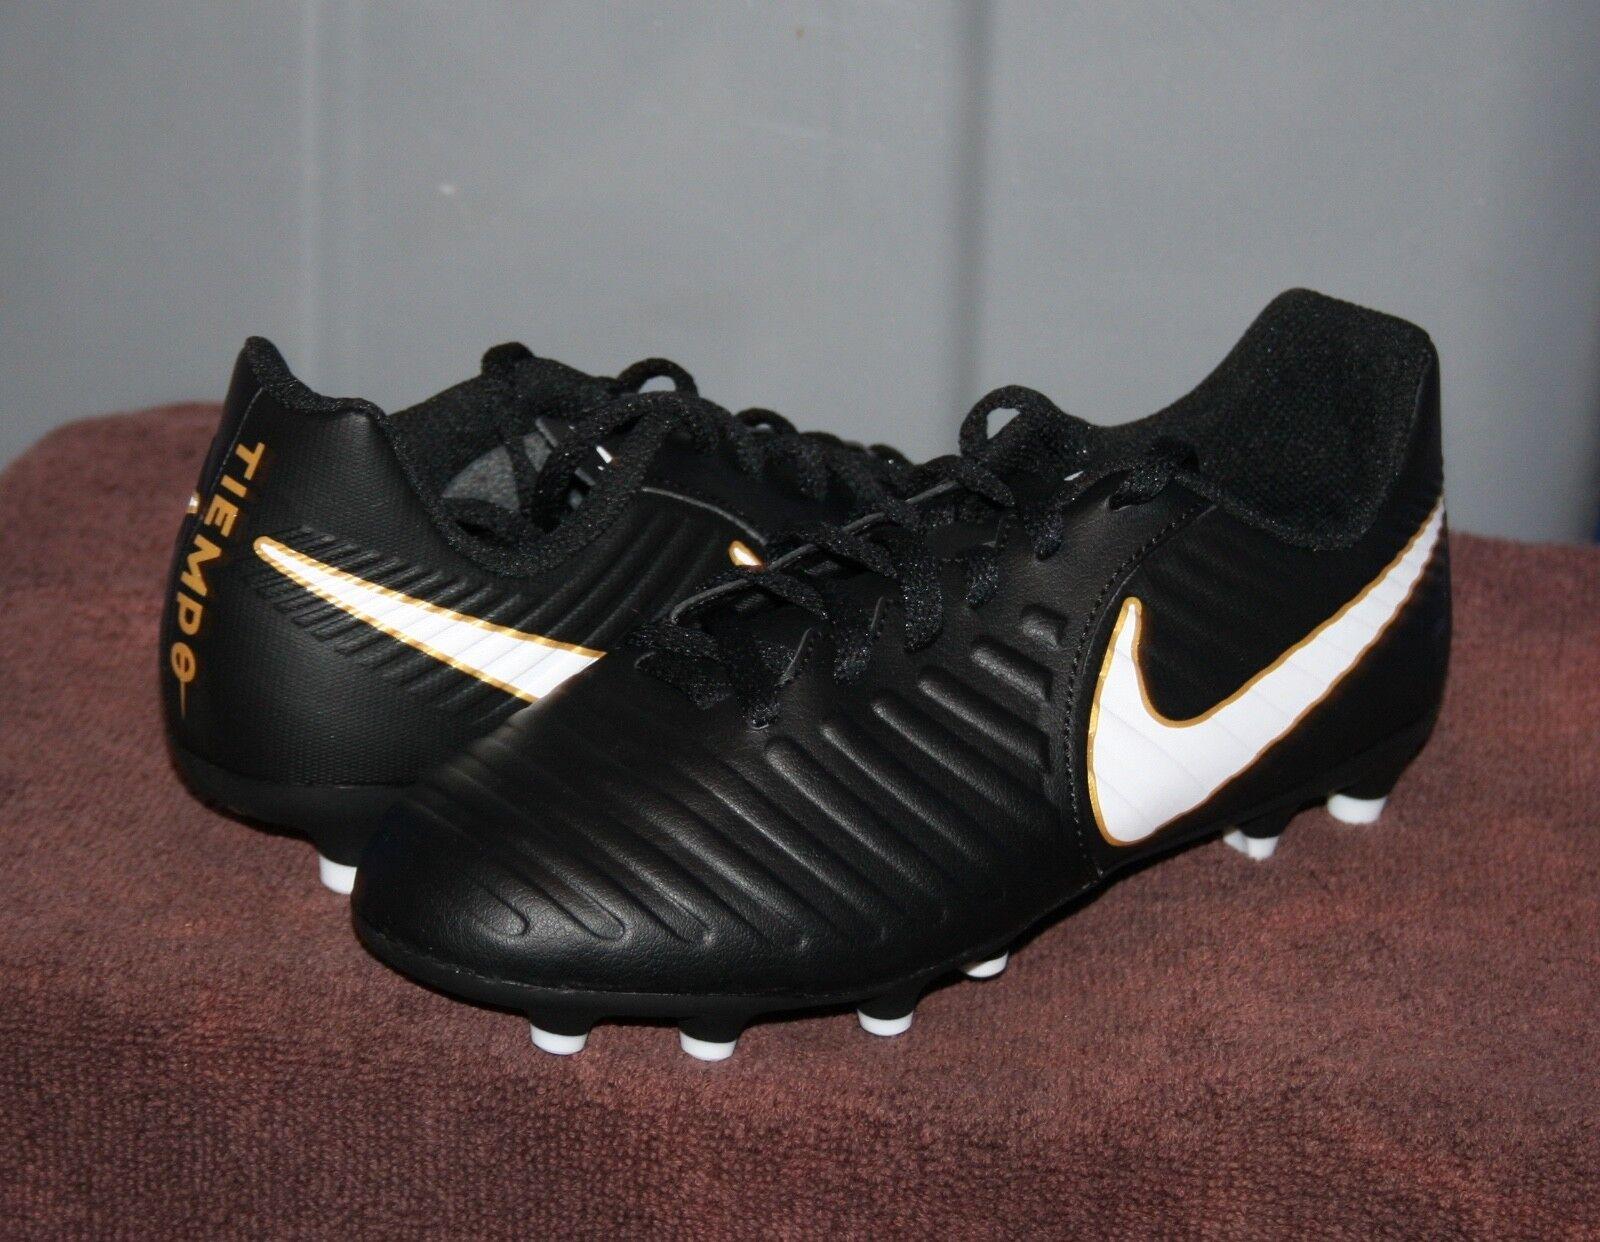 e9e8e2ccdbc517 Nike Jr Tiempo Rio IV FG Sz 3.5 Youth Soccer Cleats for sale online ...